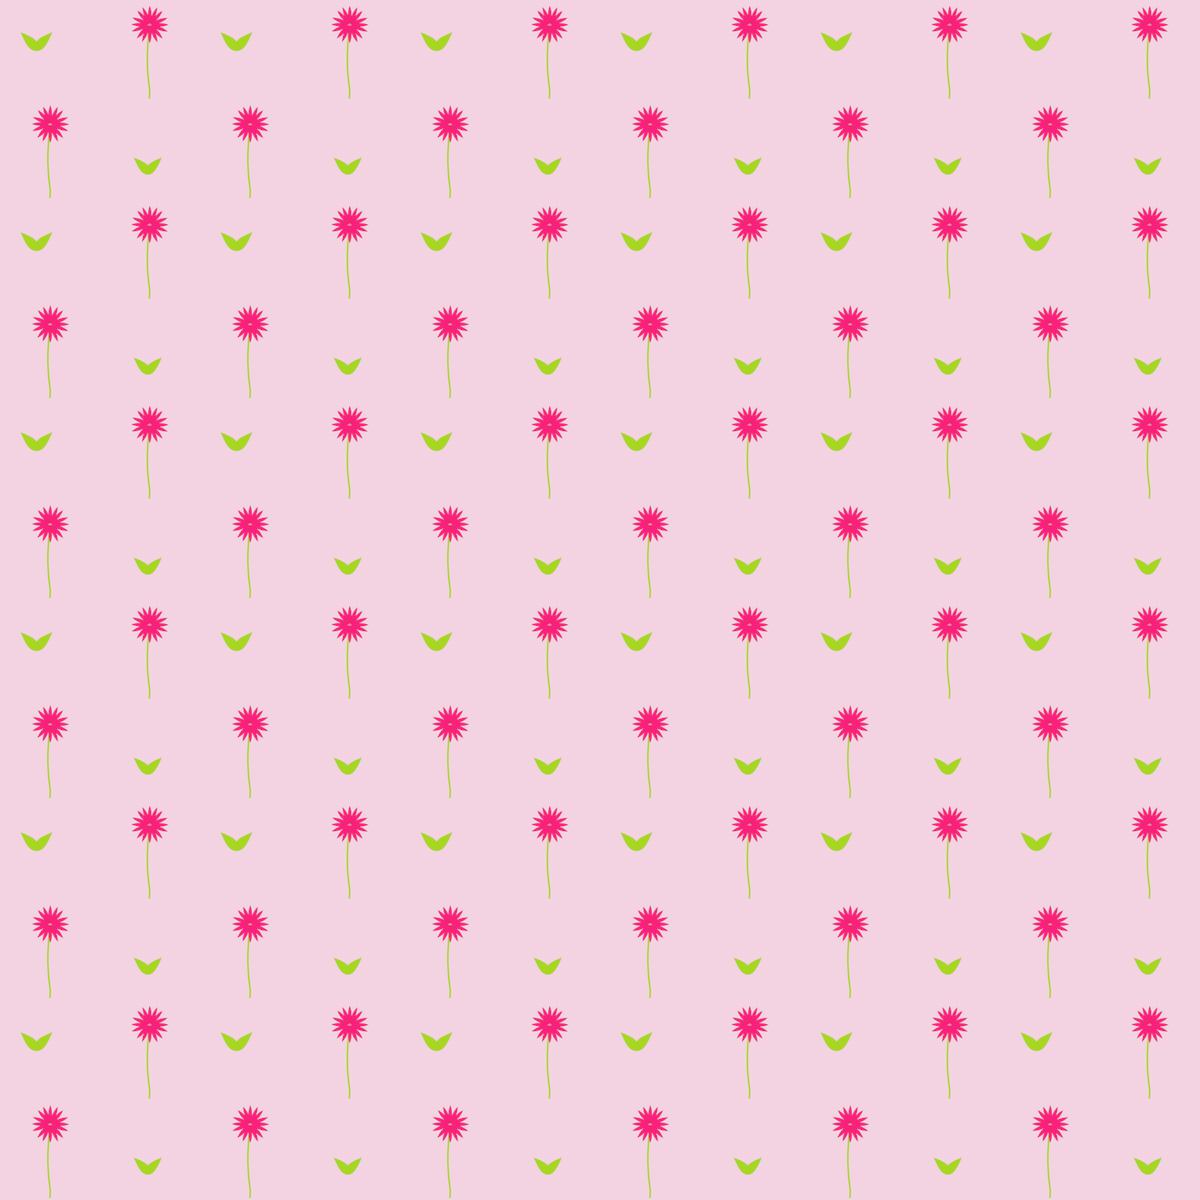 Scrapbooking Pink Flowers Pink Scrapbooking Paper